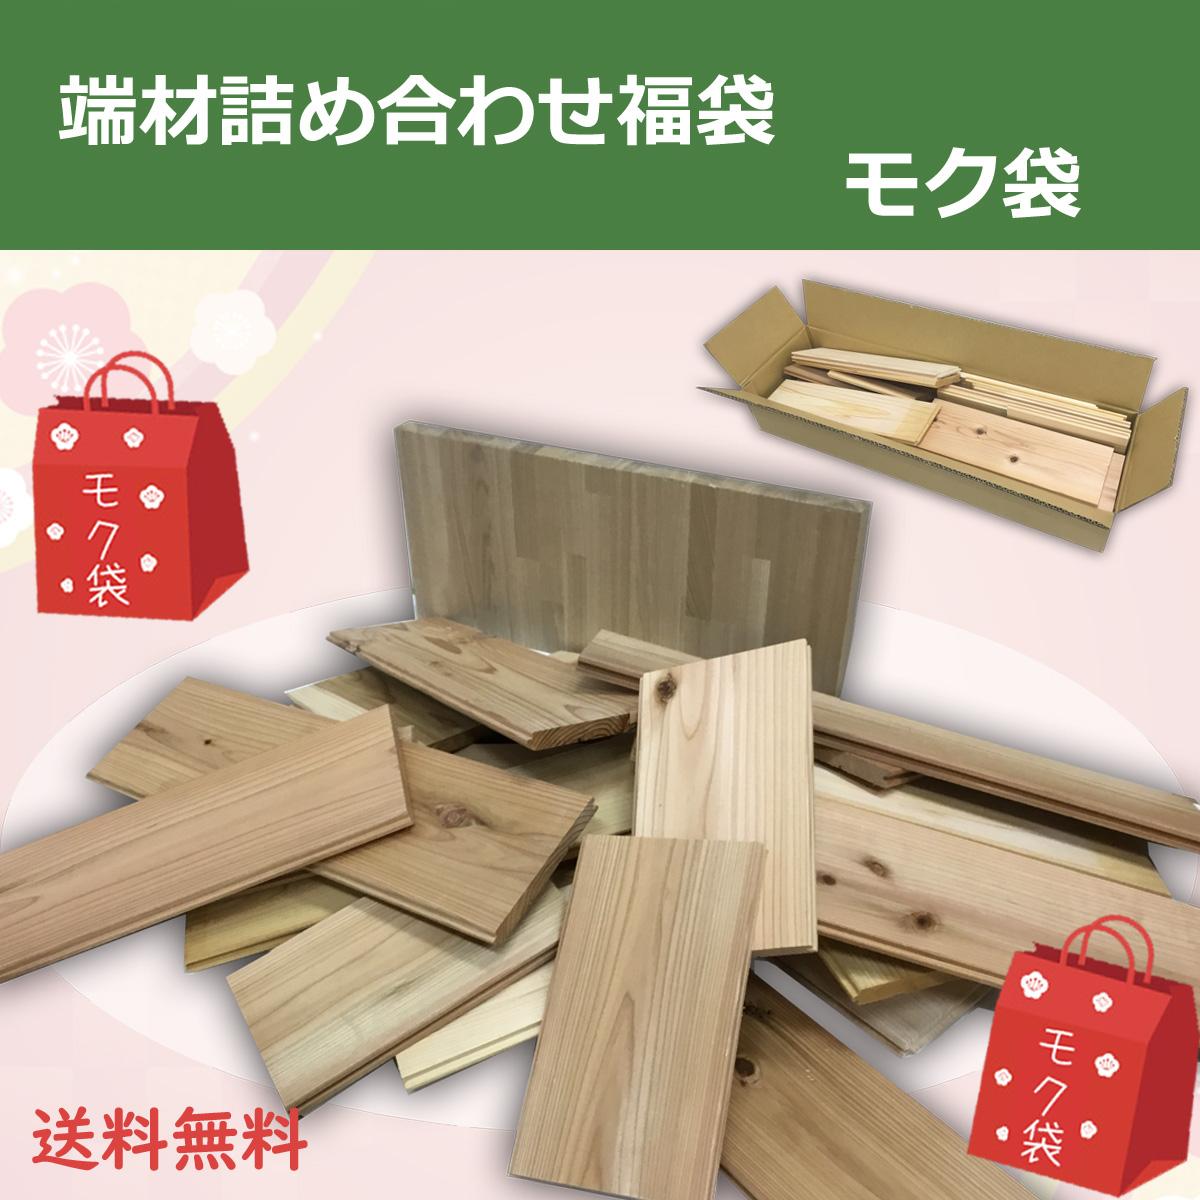 f:id:fujimokunetshop:20201127110613j:plain